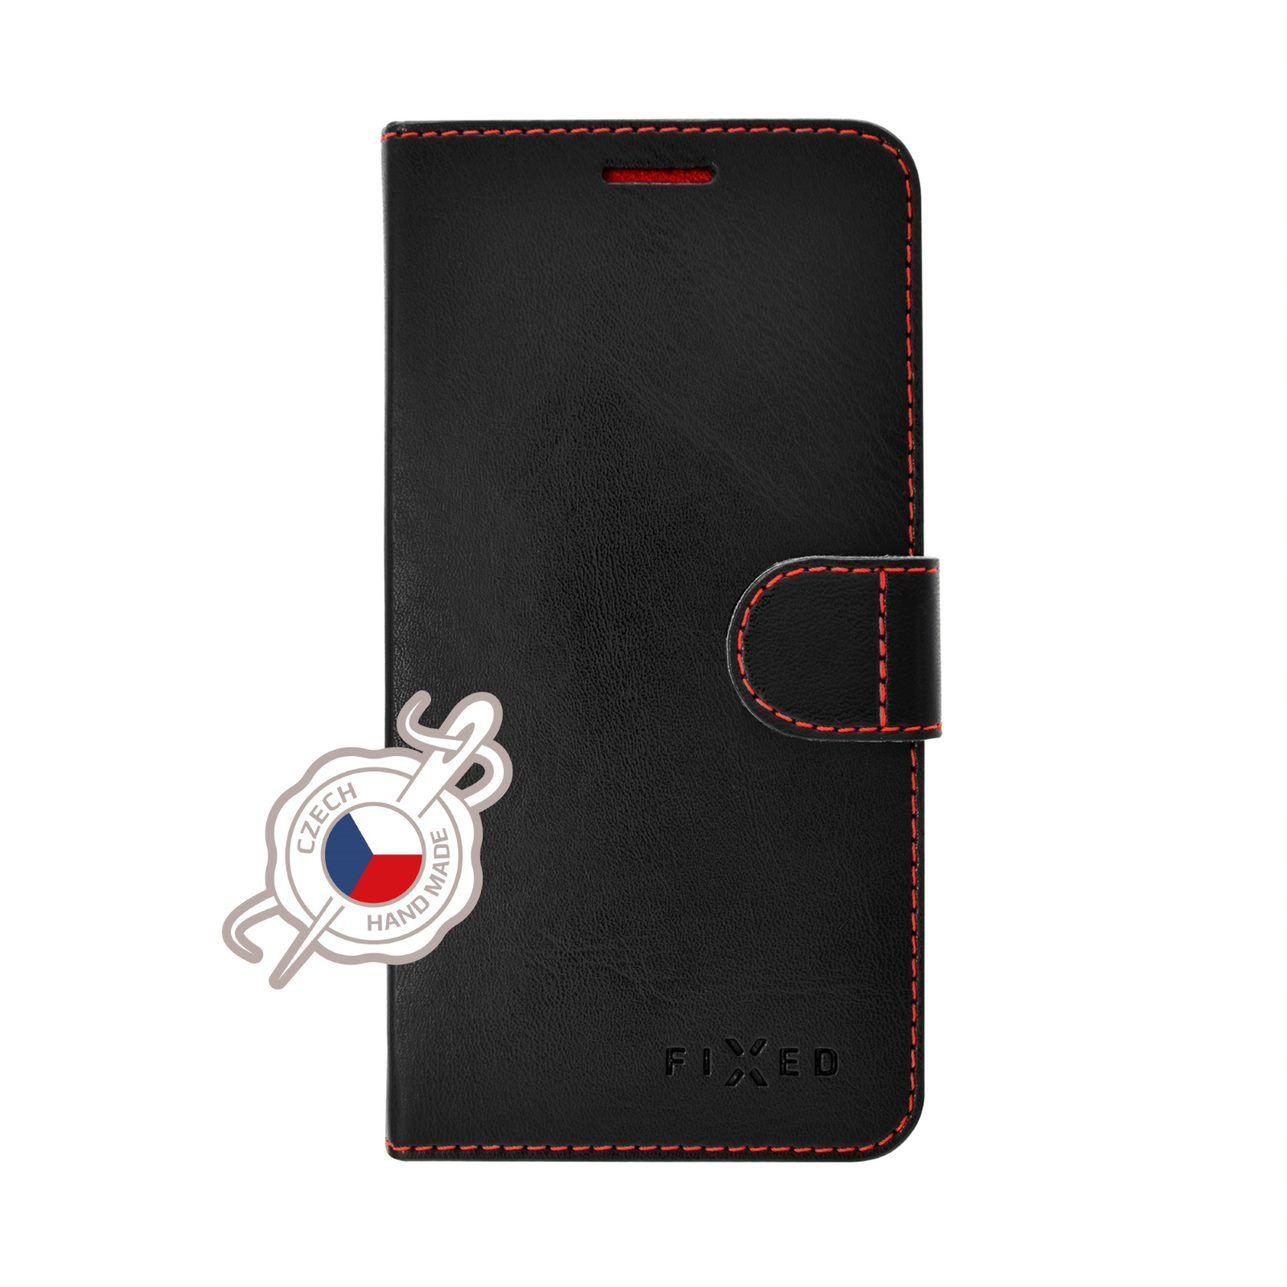 FIXED FIT flipové pouzdro pro Xiaomi Redmi Note 7/7 Pro, černé